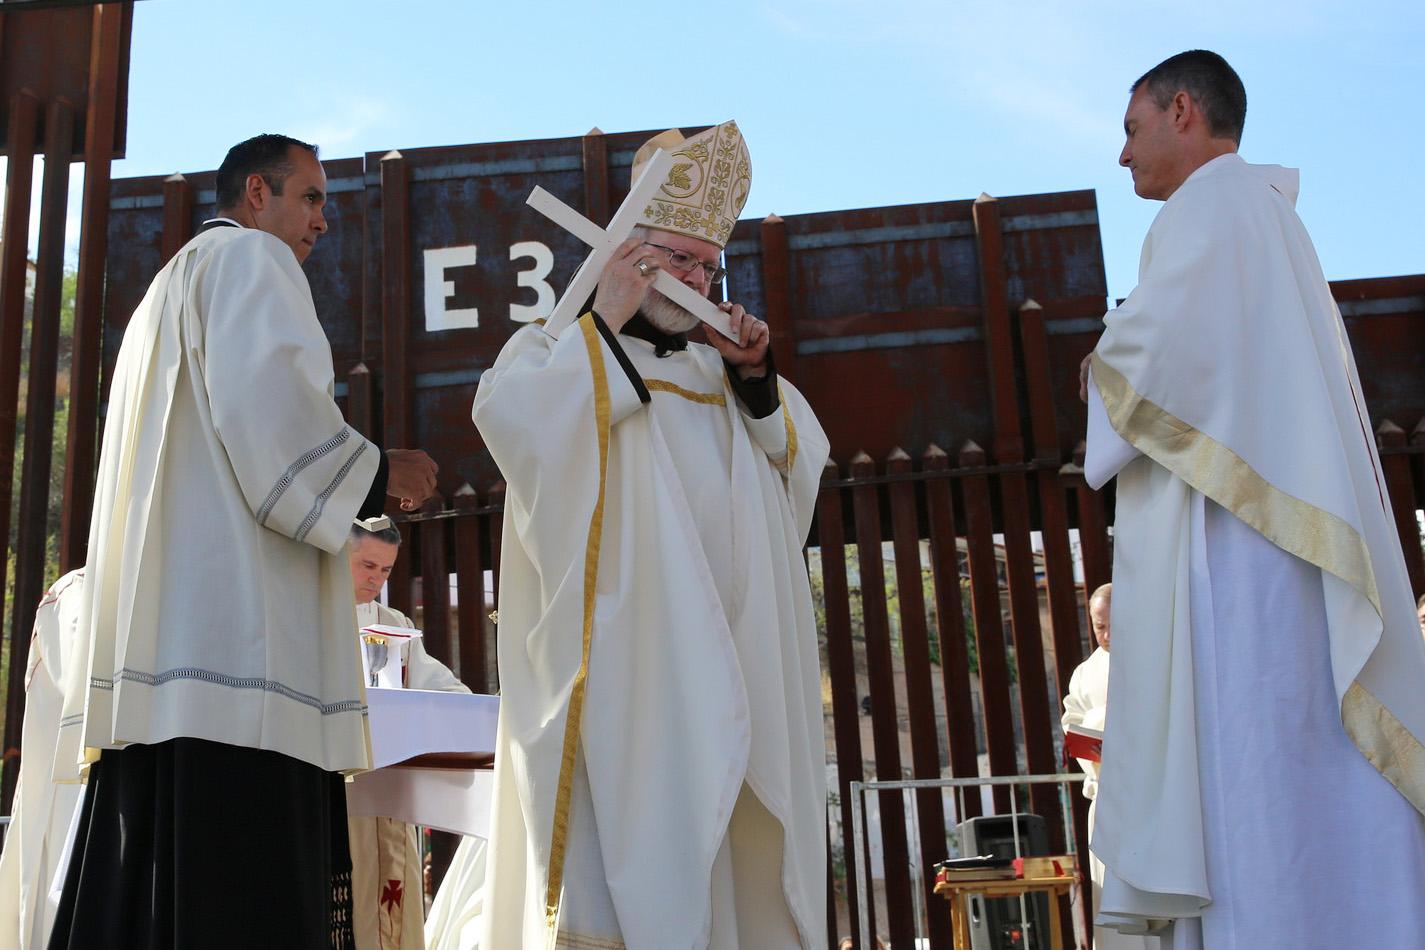 web-border-bishop-mass-george-martell-the-pilot-media-group-cc